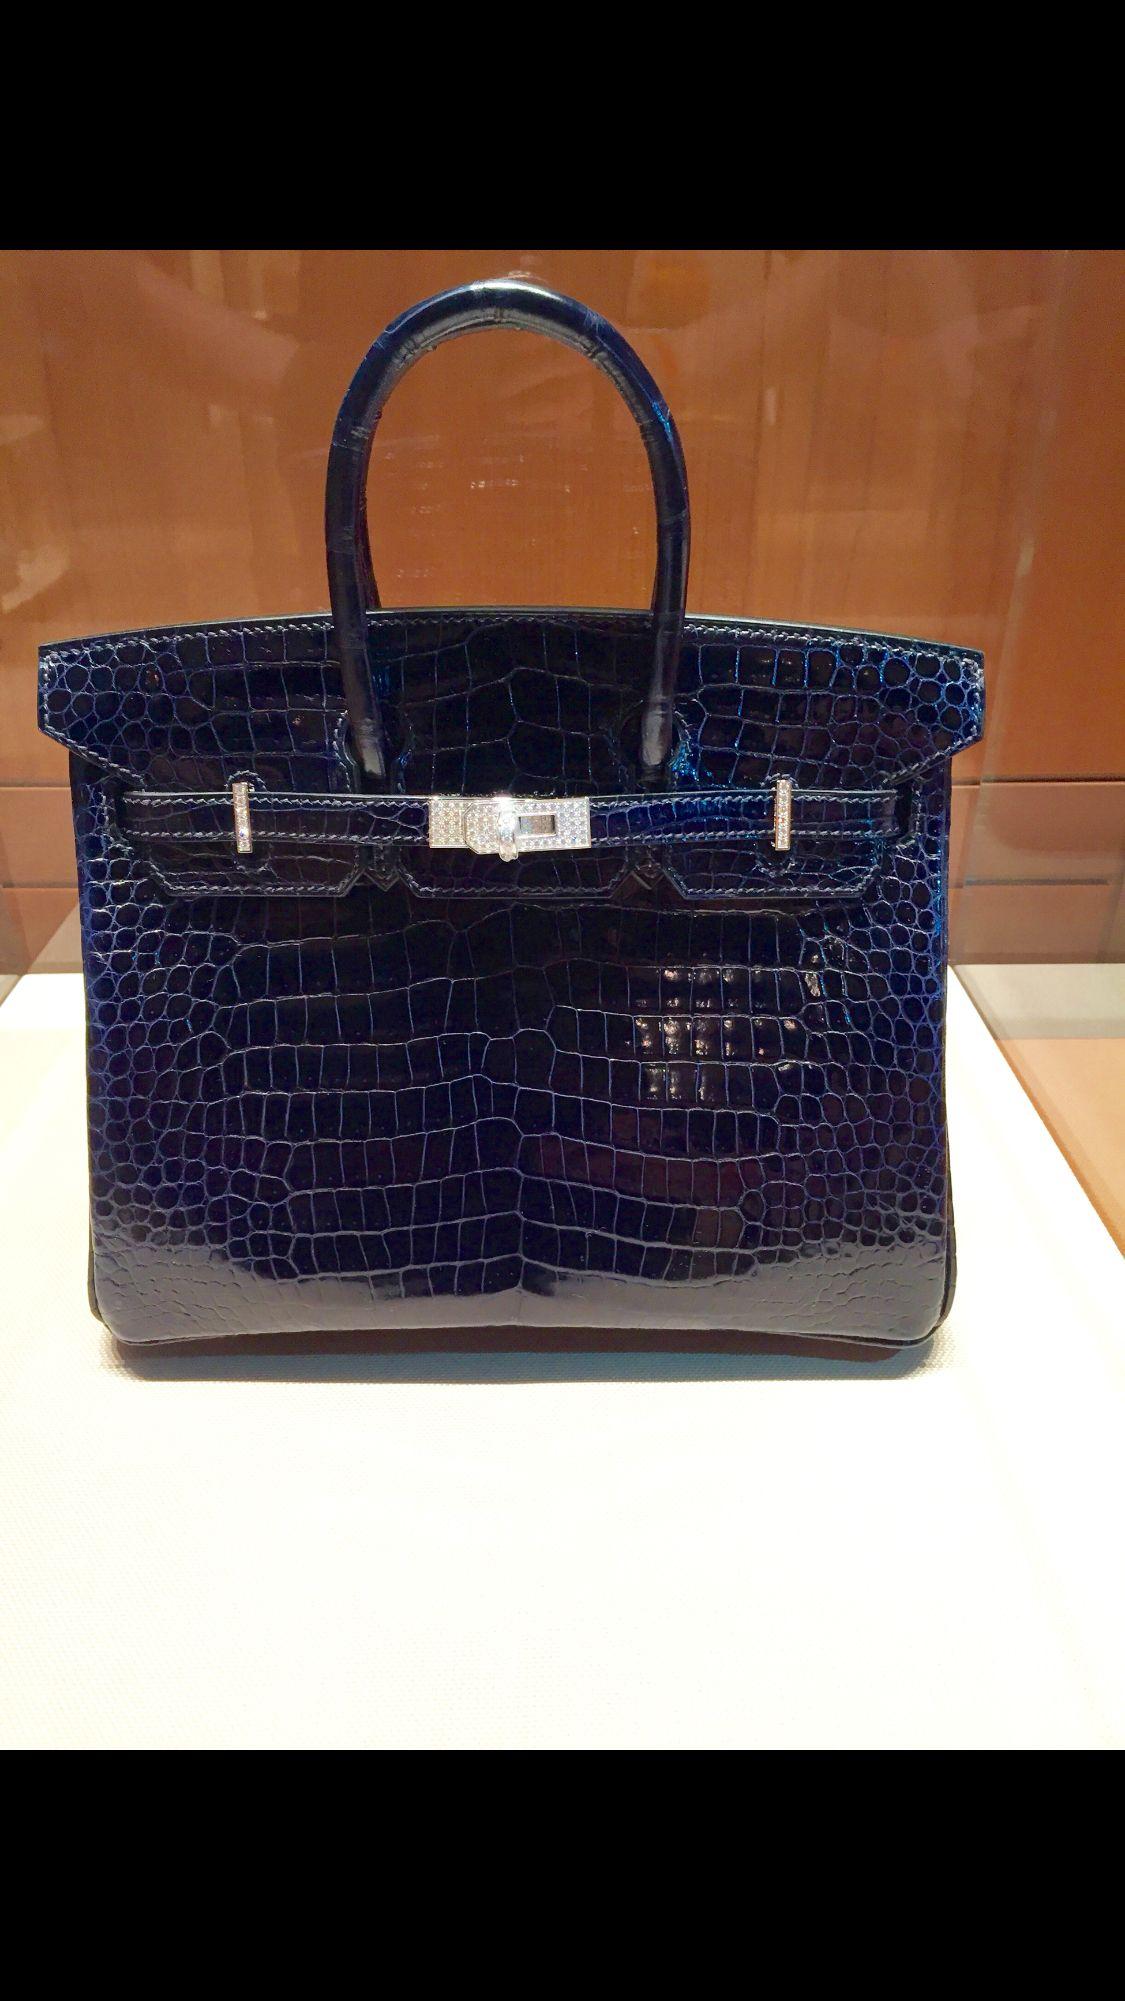 Sell Your Hermes Birkin Bags To The Worlds Premier Handbag Buyer!  www.LuxuryBuyers.com 51ada14fafeed